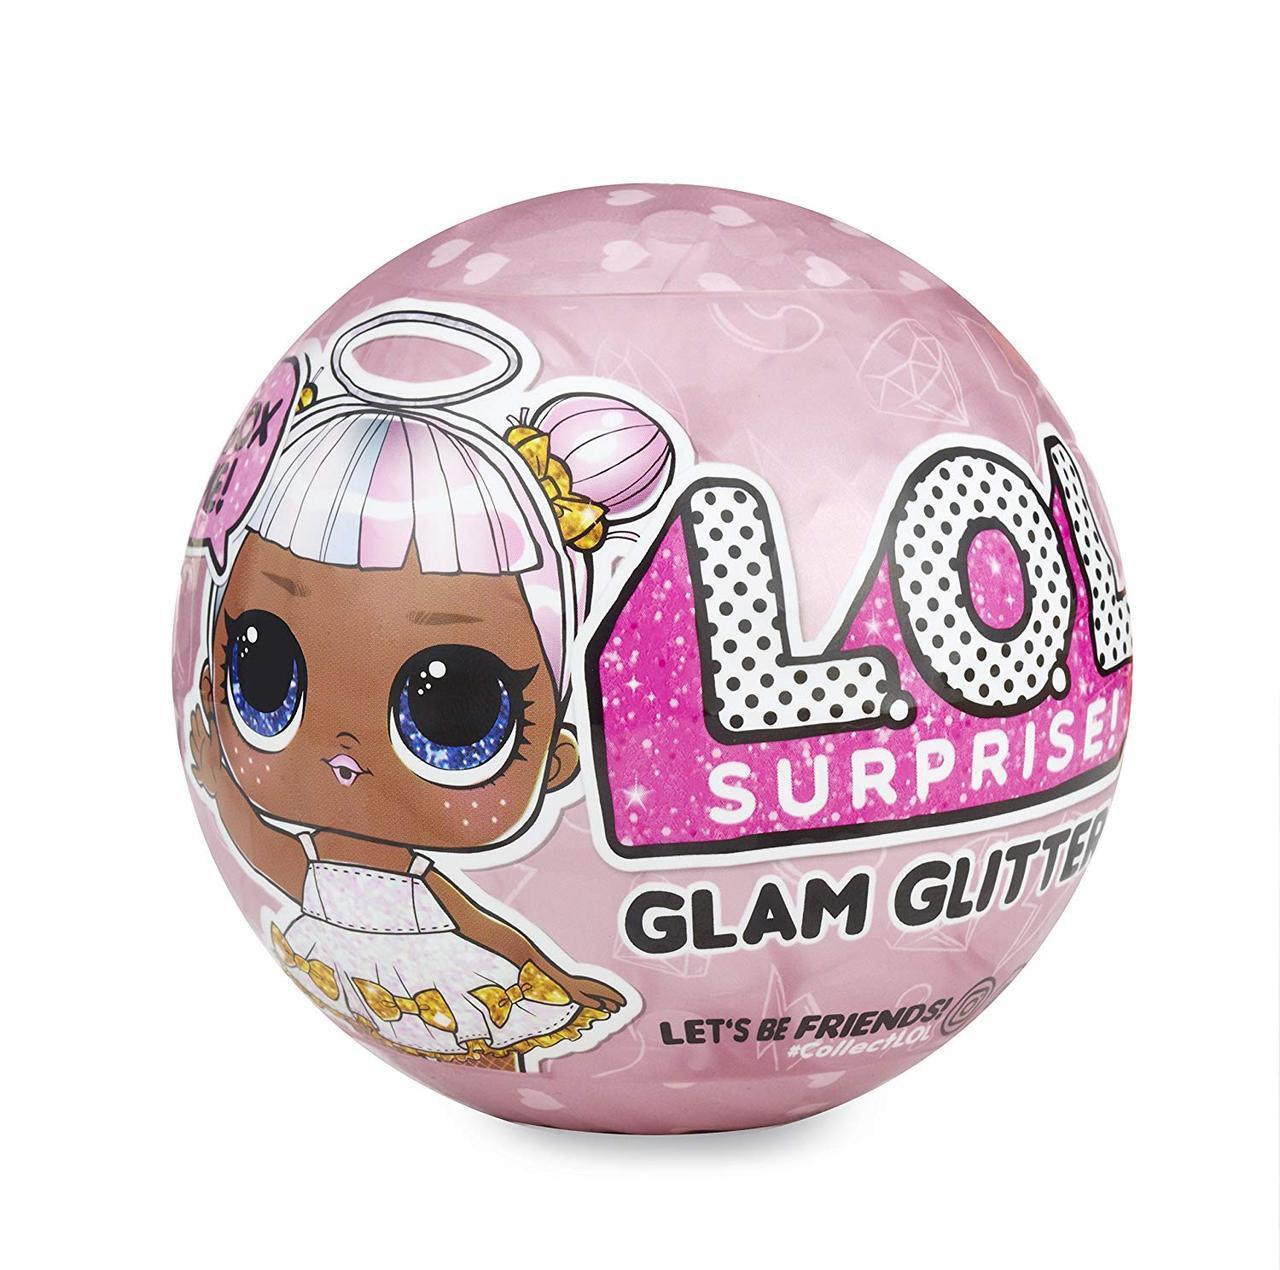 ЛОЛ Сюрприз  Блестящая серия Глэм Глиттер L.O.L. Surprise! Glam Glitter Series Doll with 7 Surprises